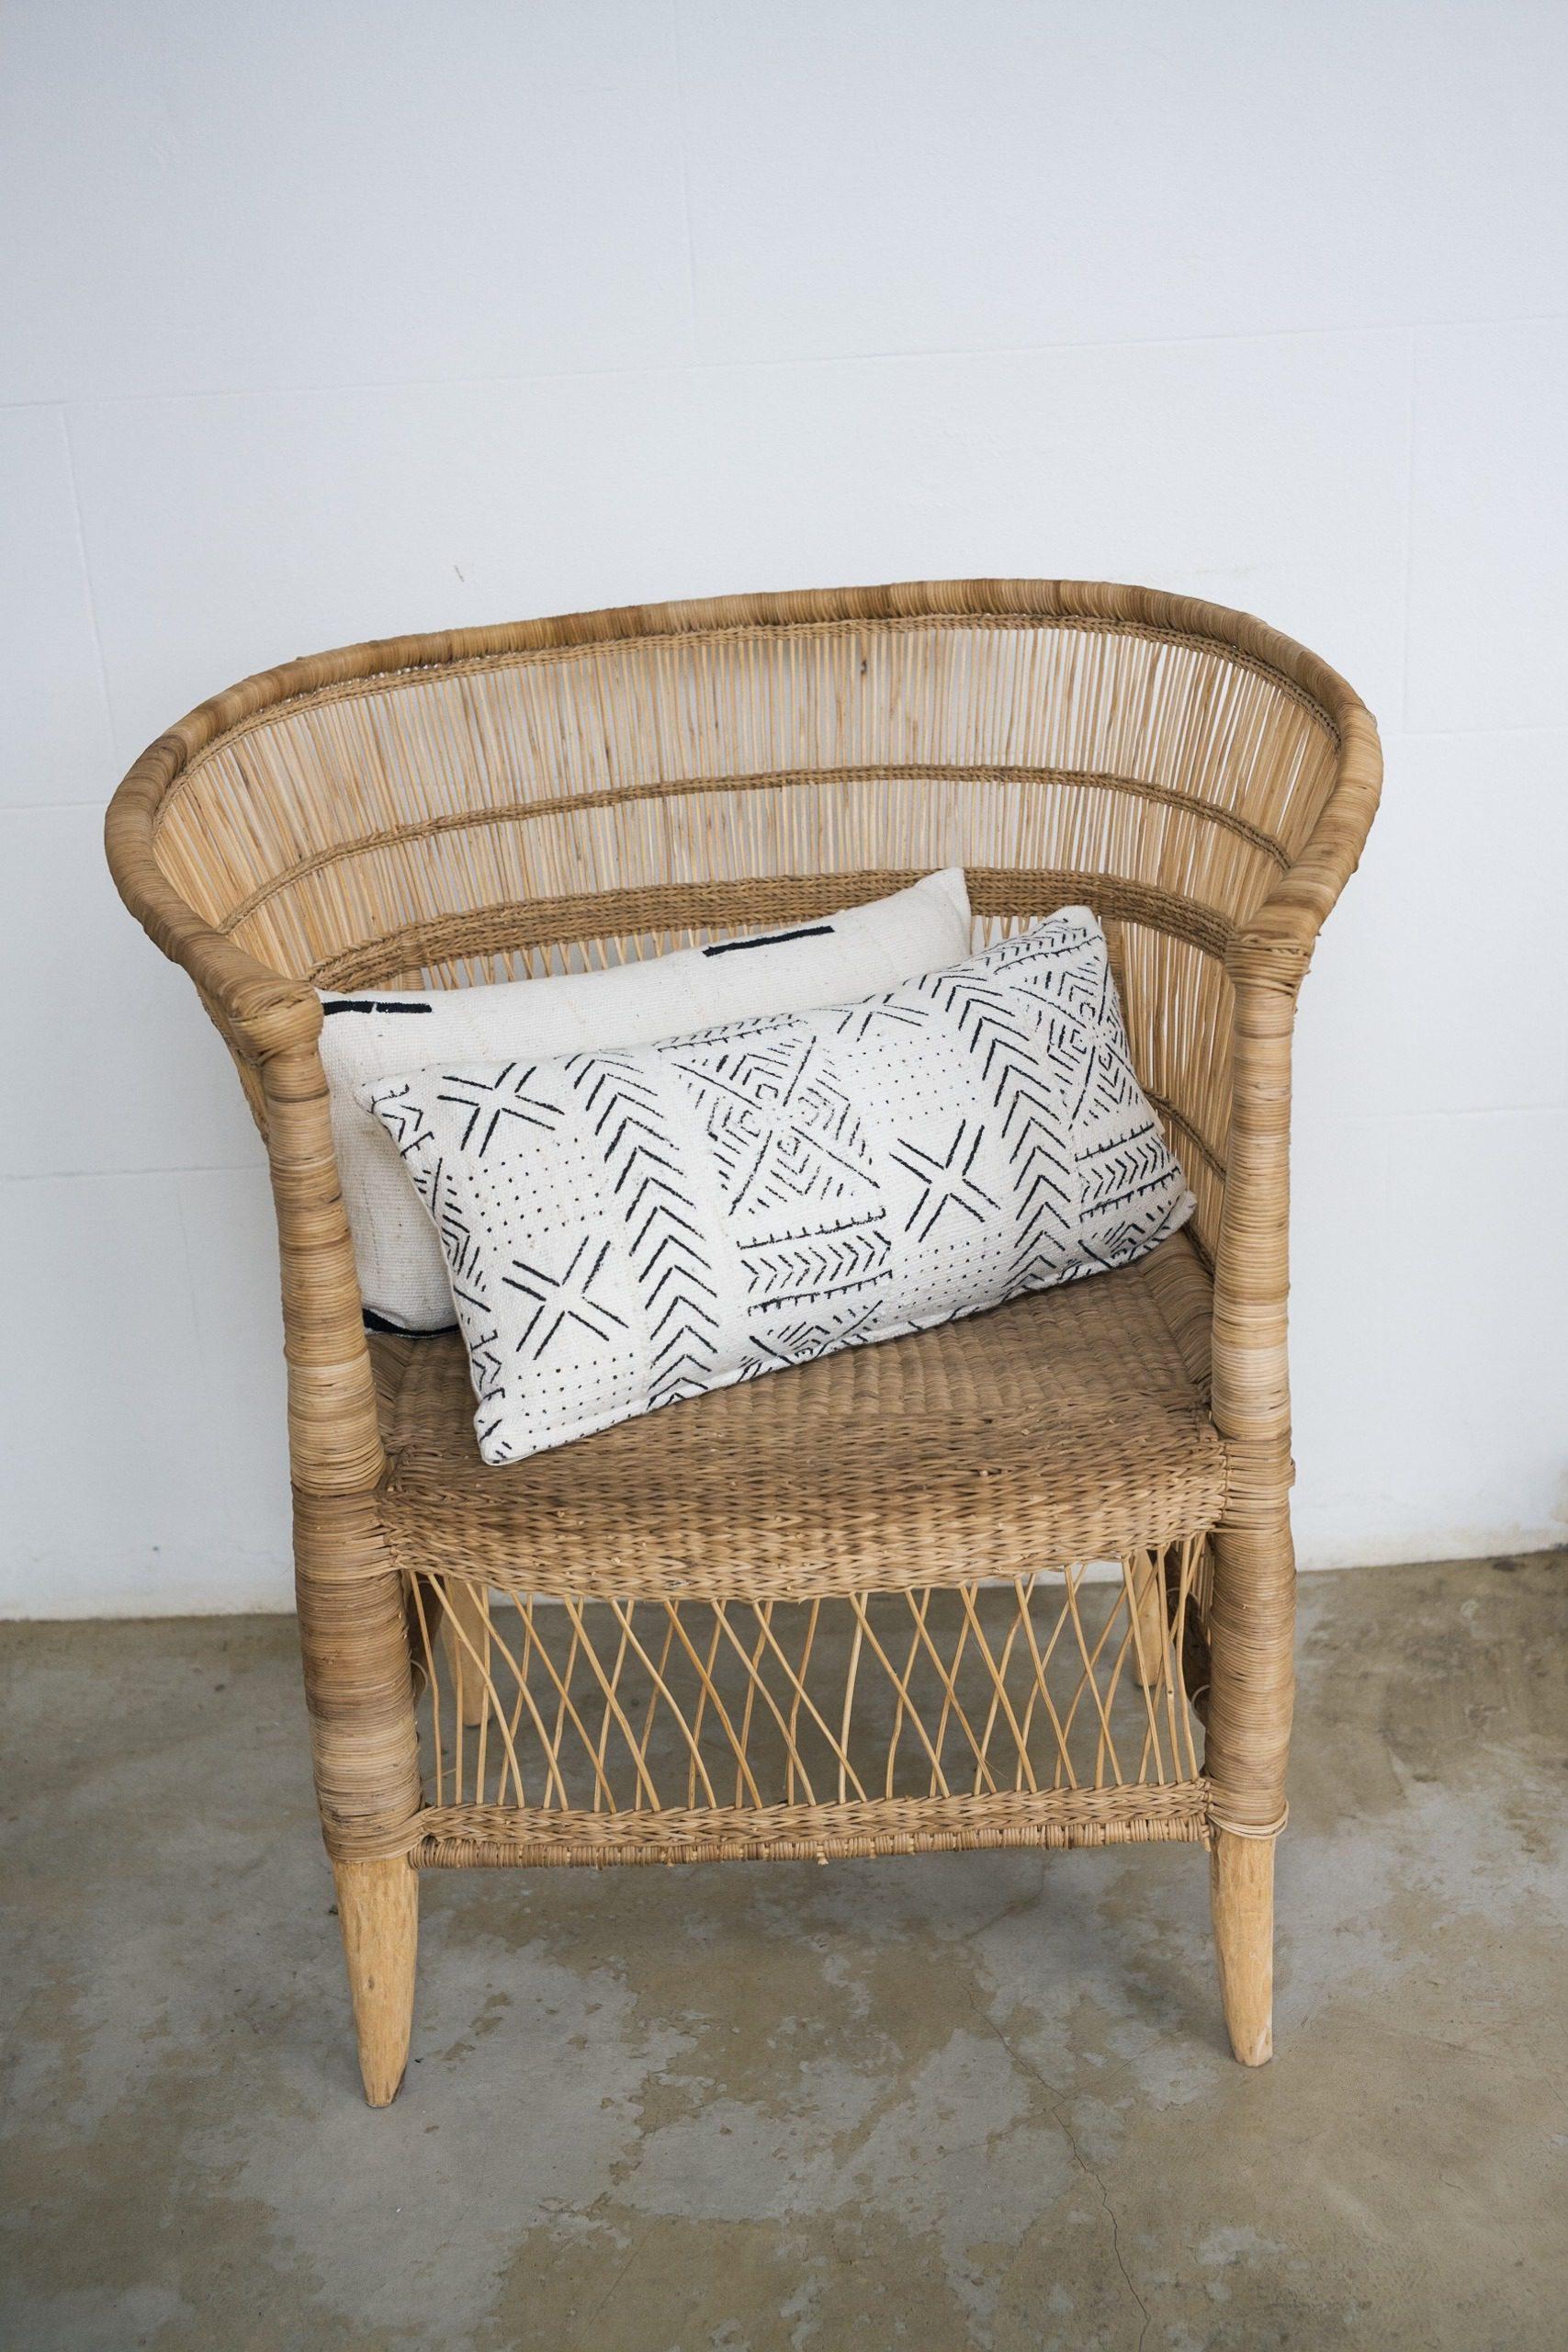 Pillows on chair